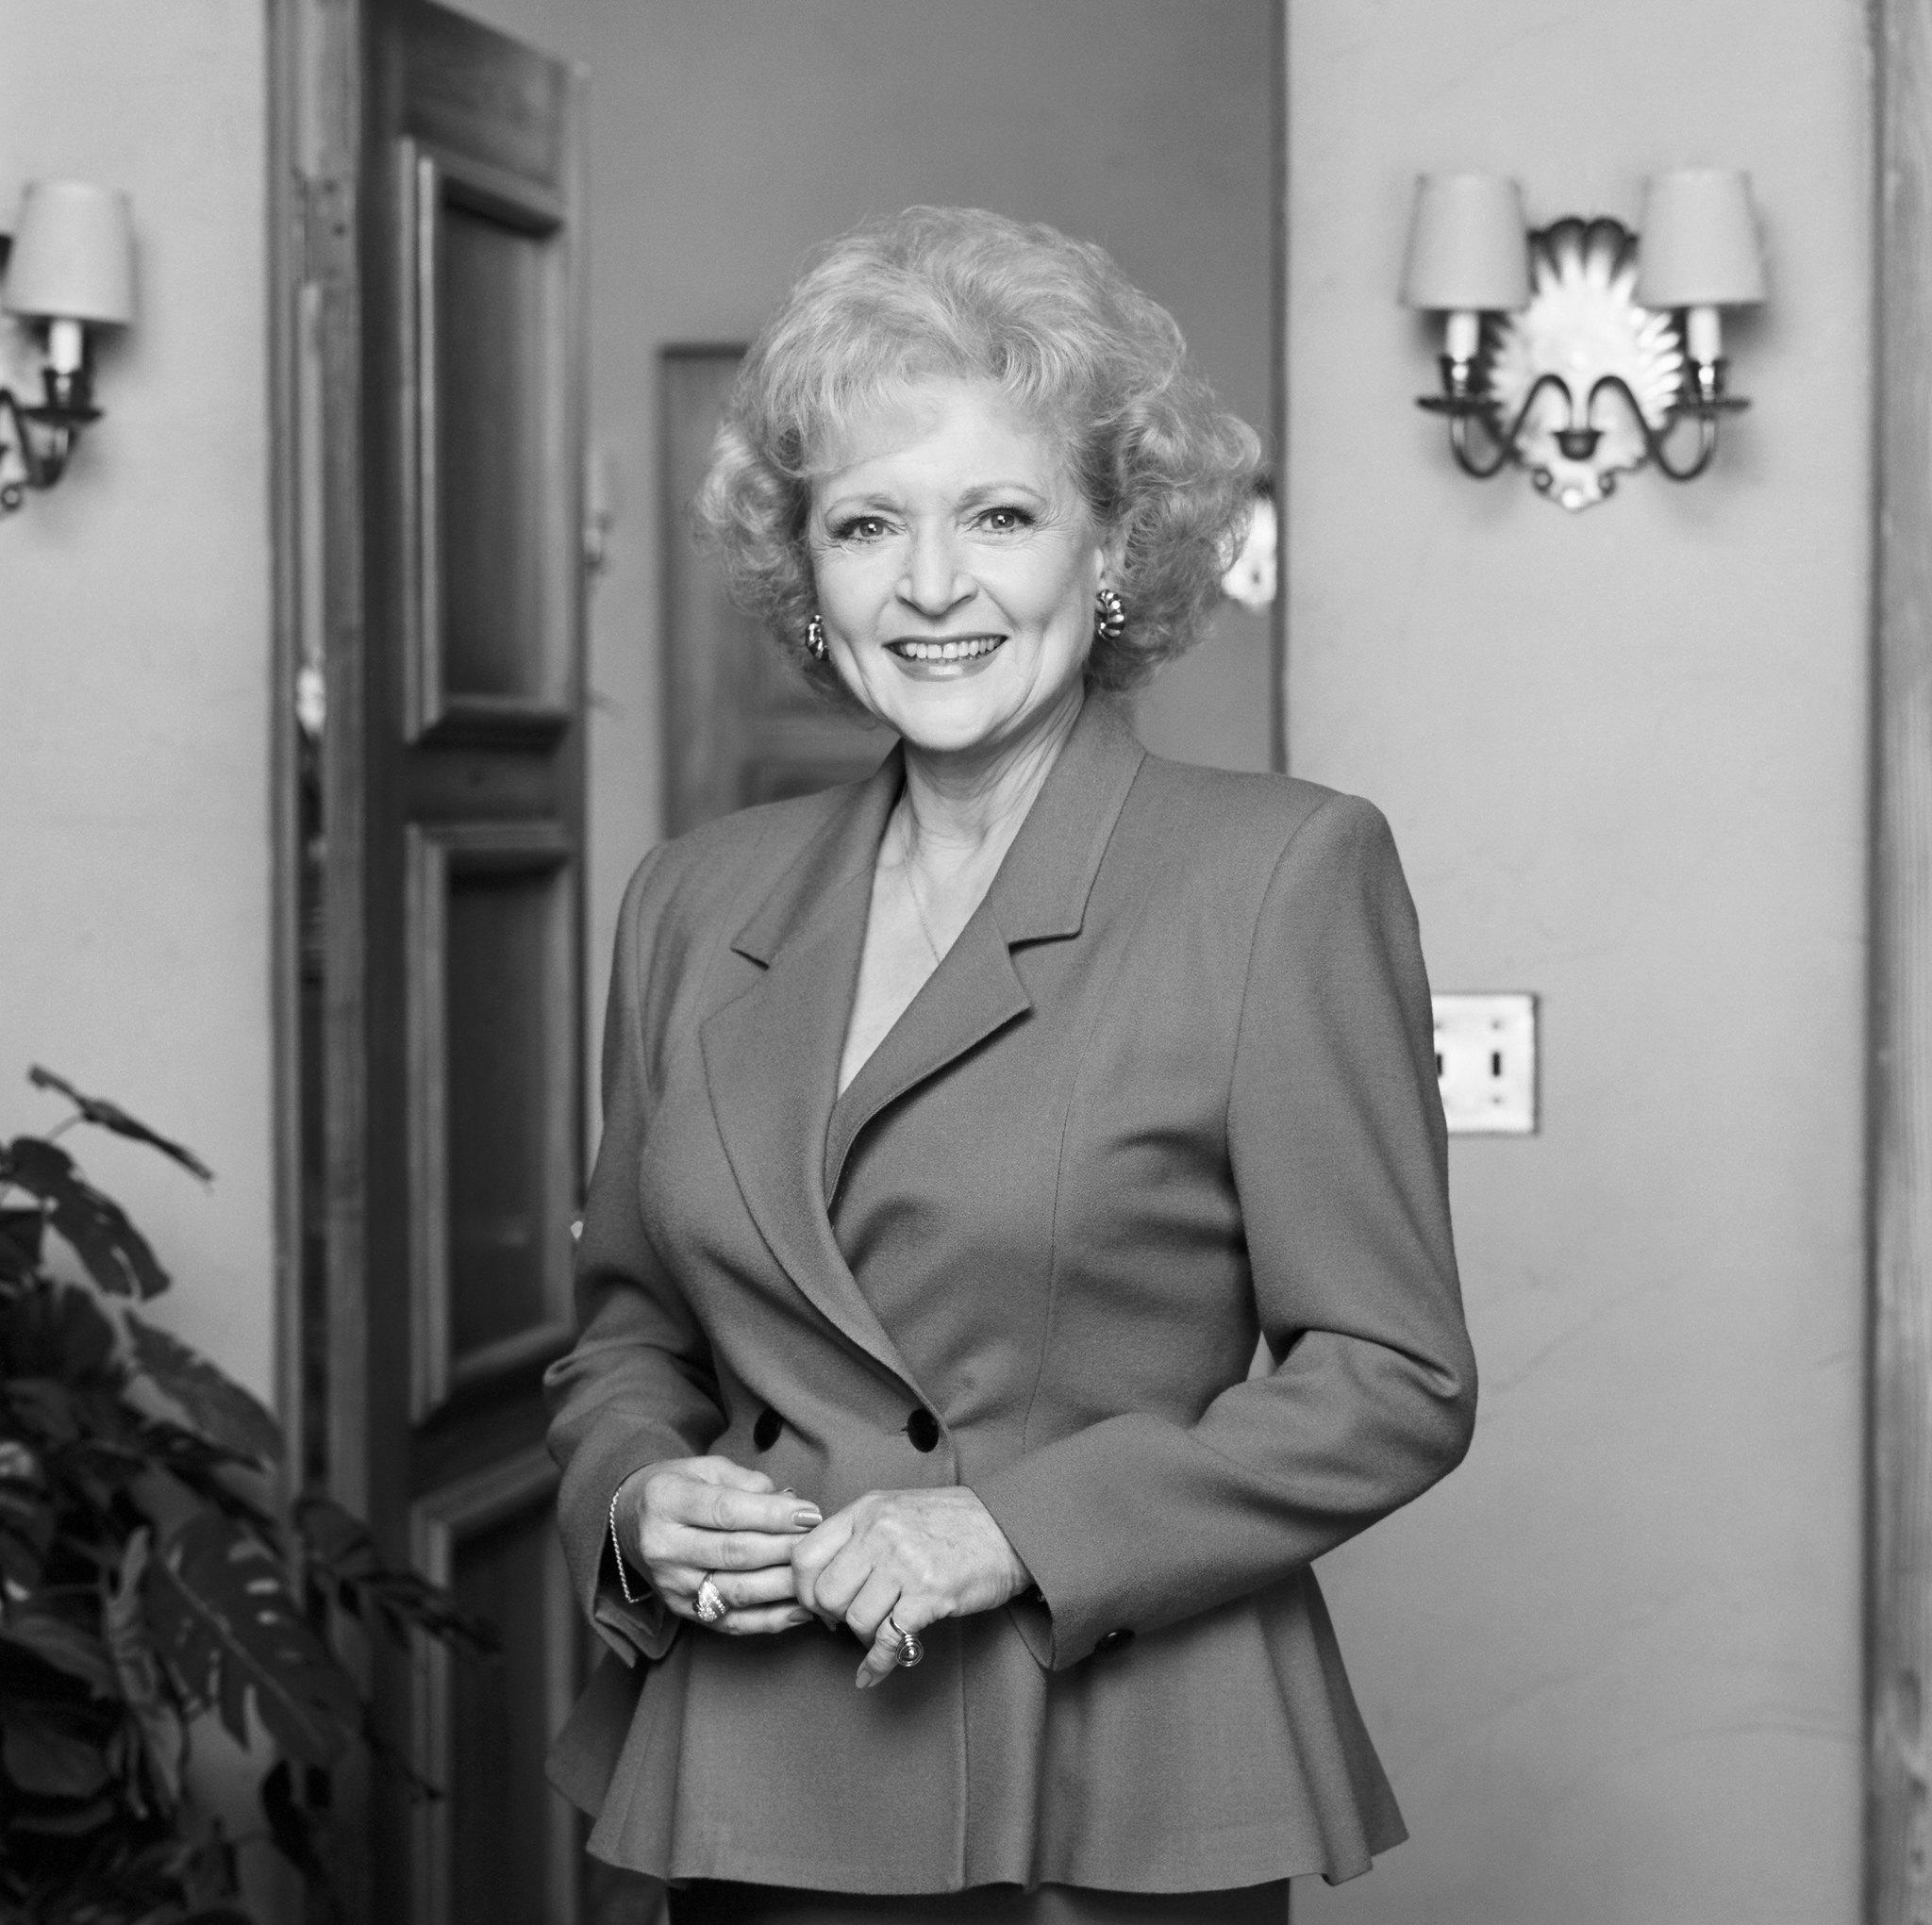 Nichelle Nichols born December 28, 1932 (age 85) advise